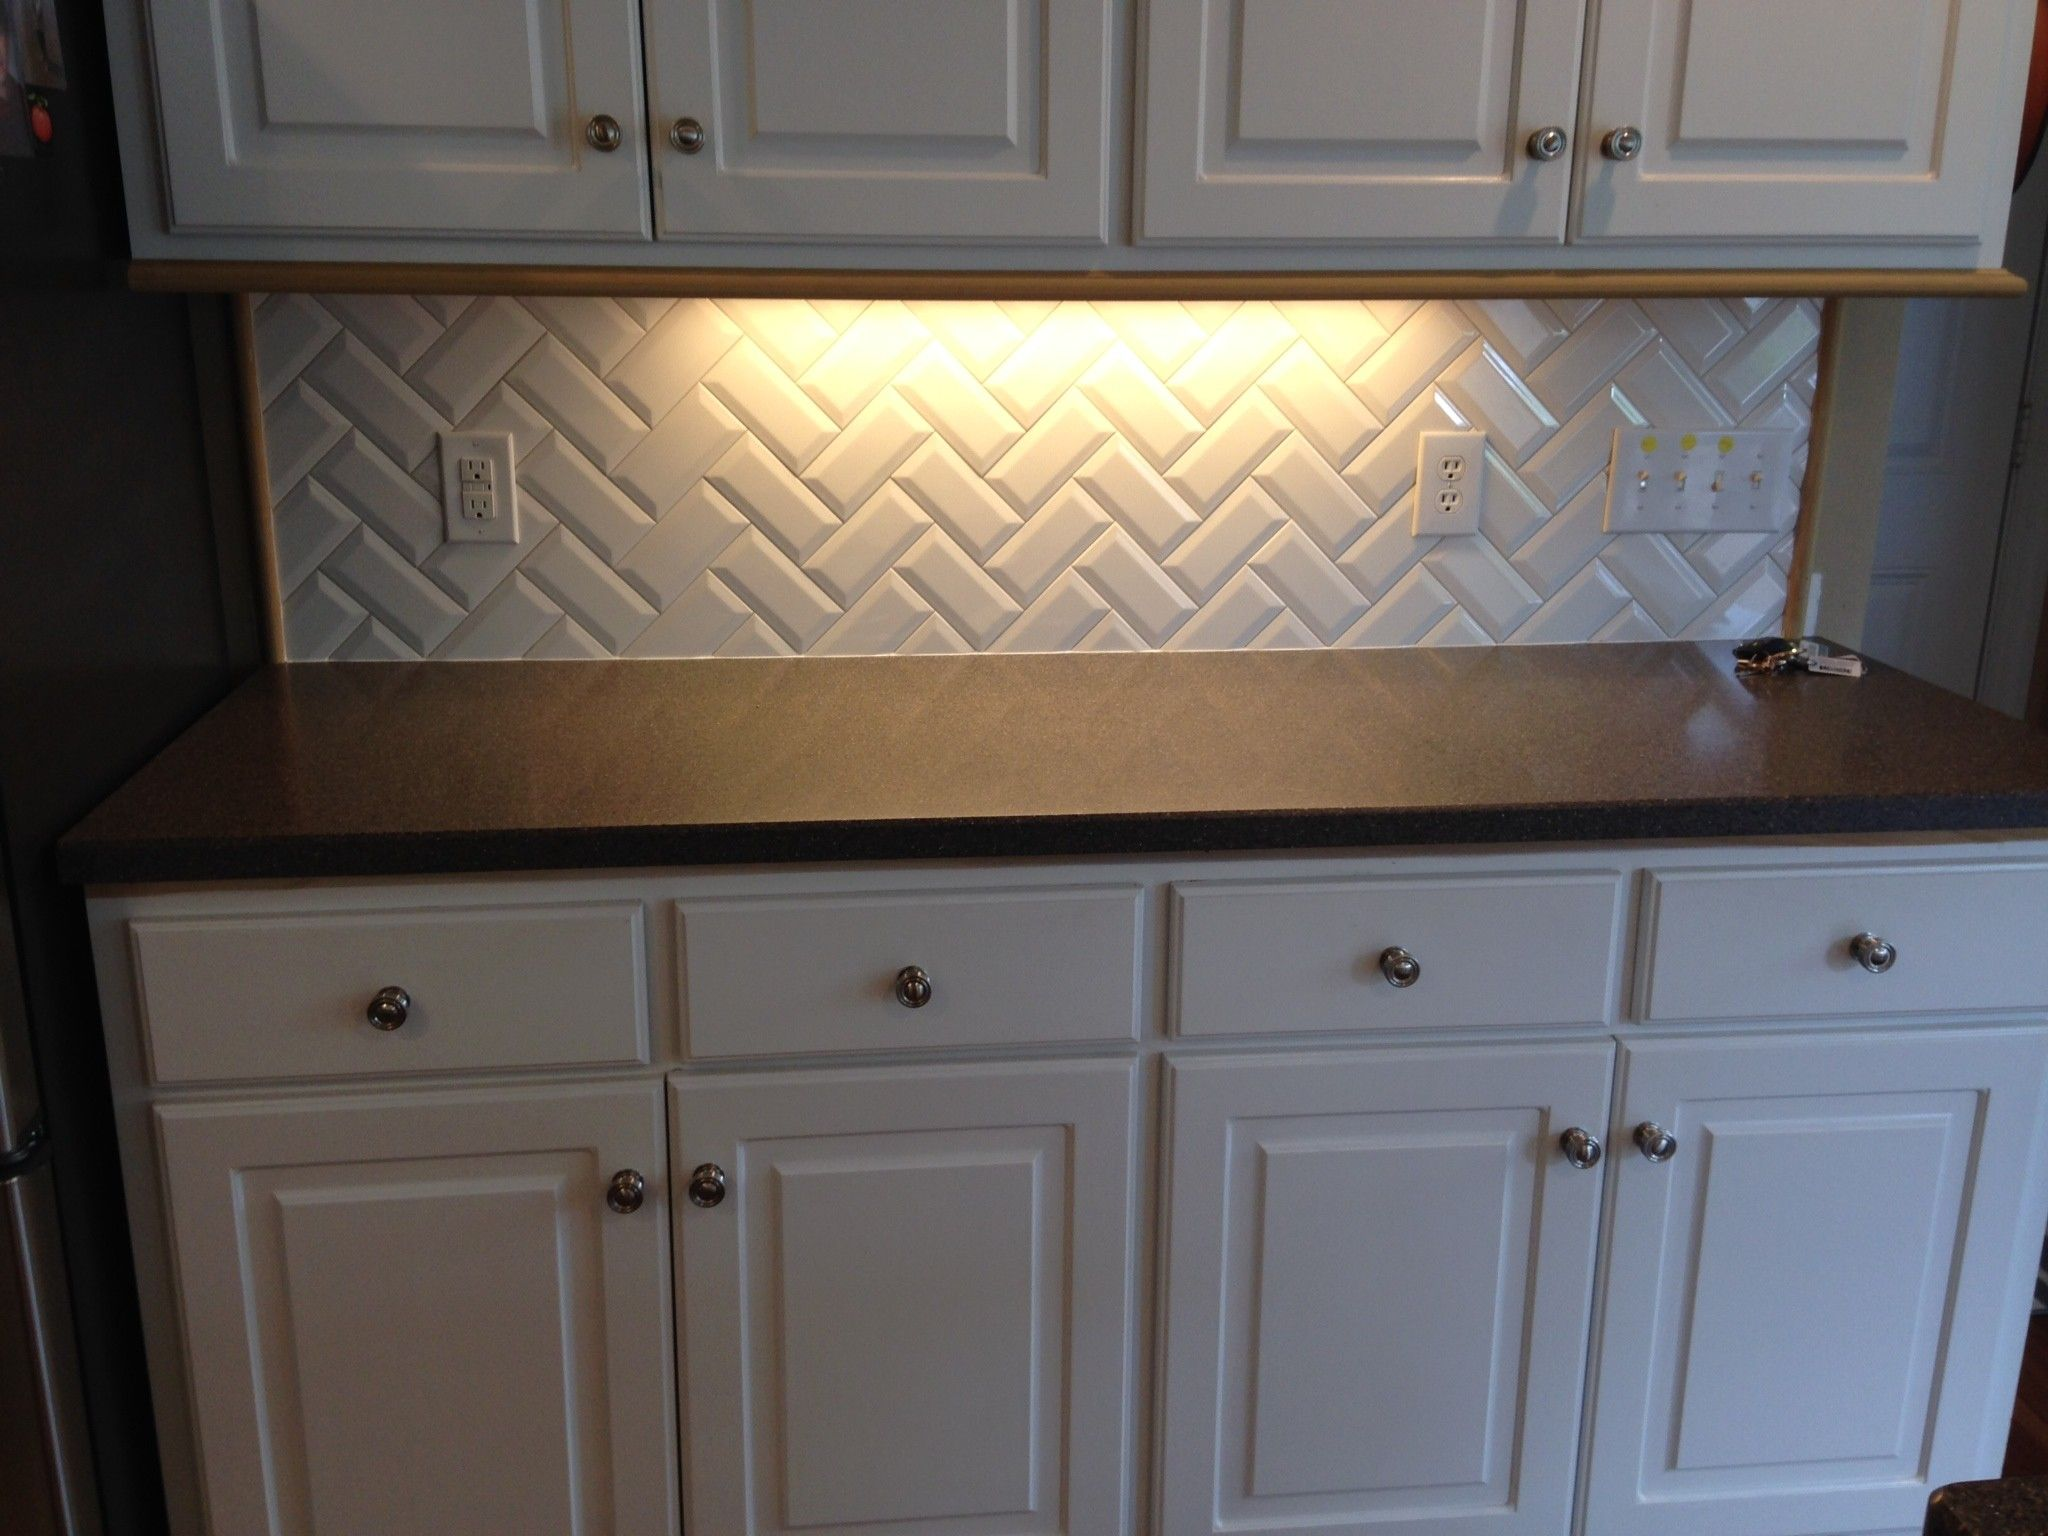 white tile backsplash kitchen cabinet top decor primus 3x6 quot beveled subway in herringbone